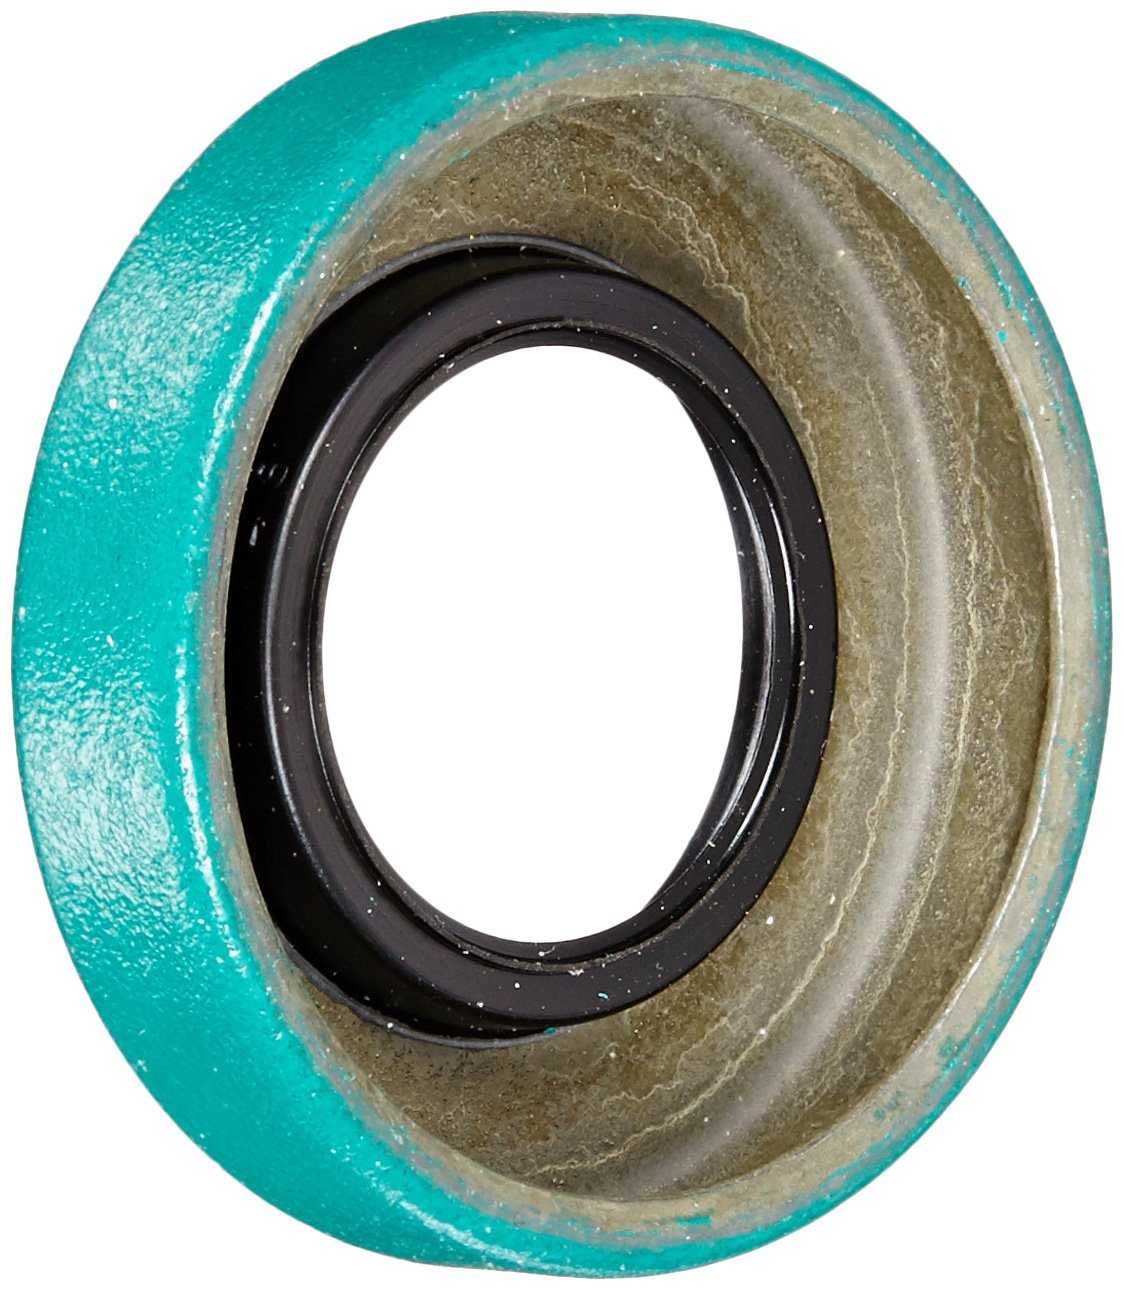 R Lip Code HM14 Style SKF 5946 LDS /& Small Bore Seal 1.124 Bore Diameter Inch 0.594 Shaft Diameter 0.25 Width